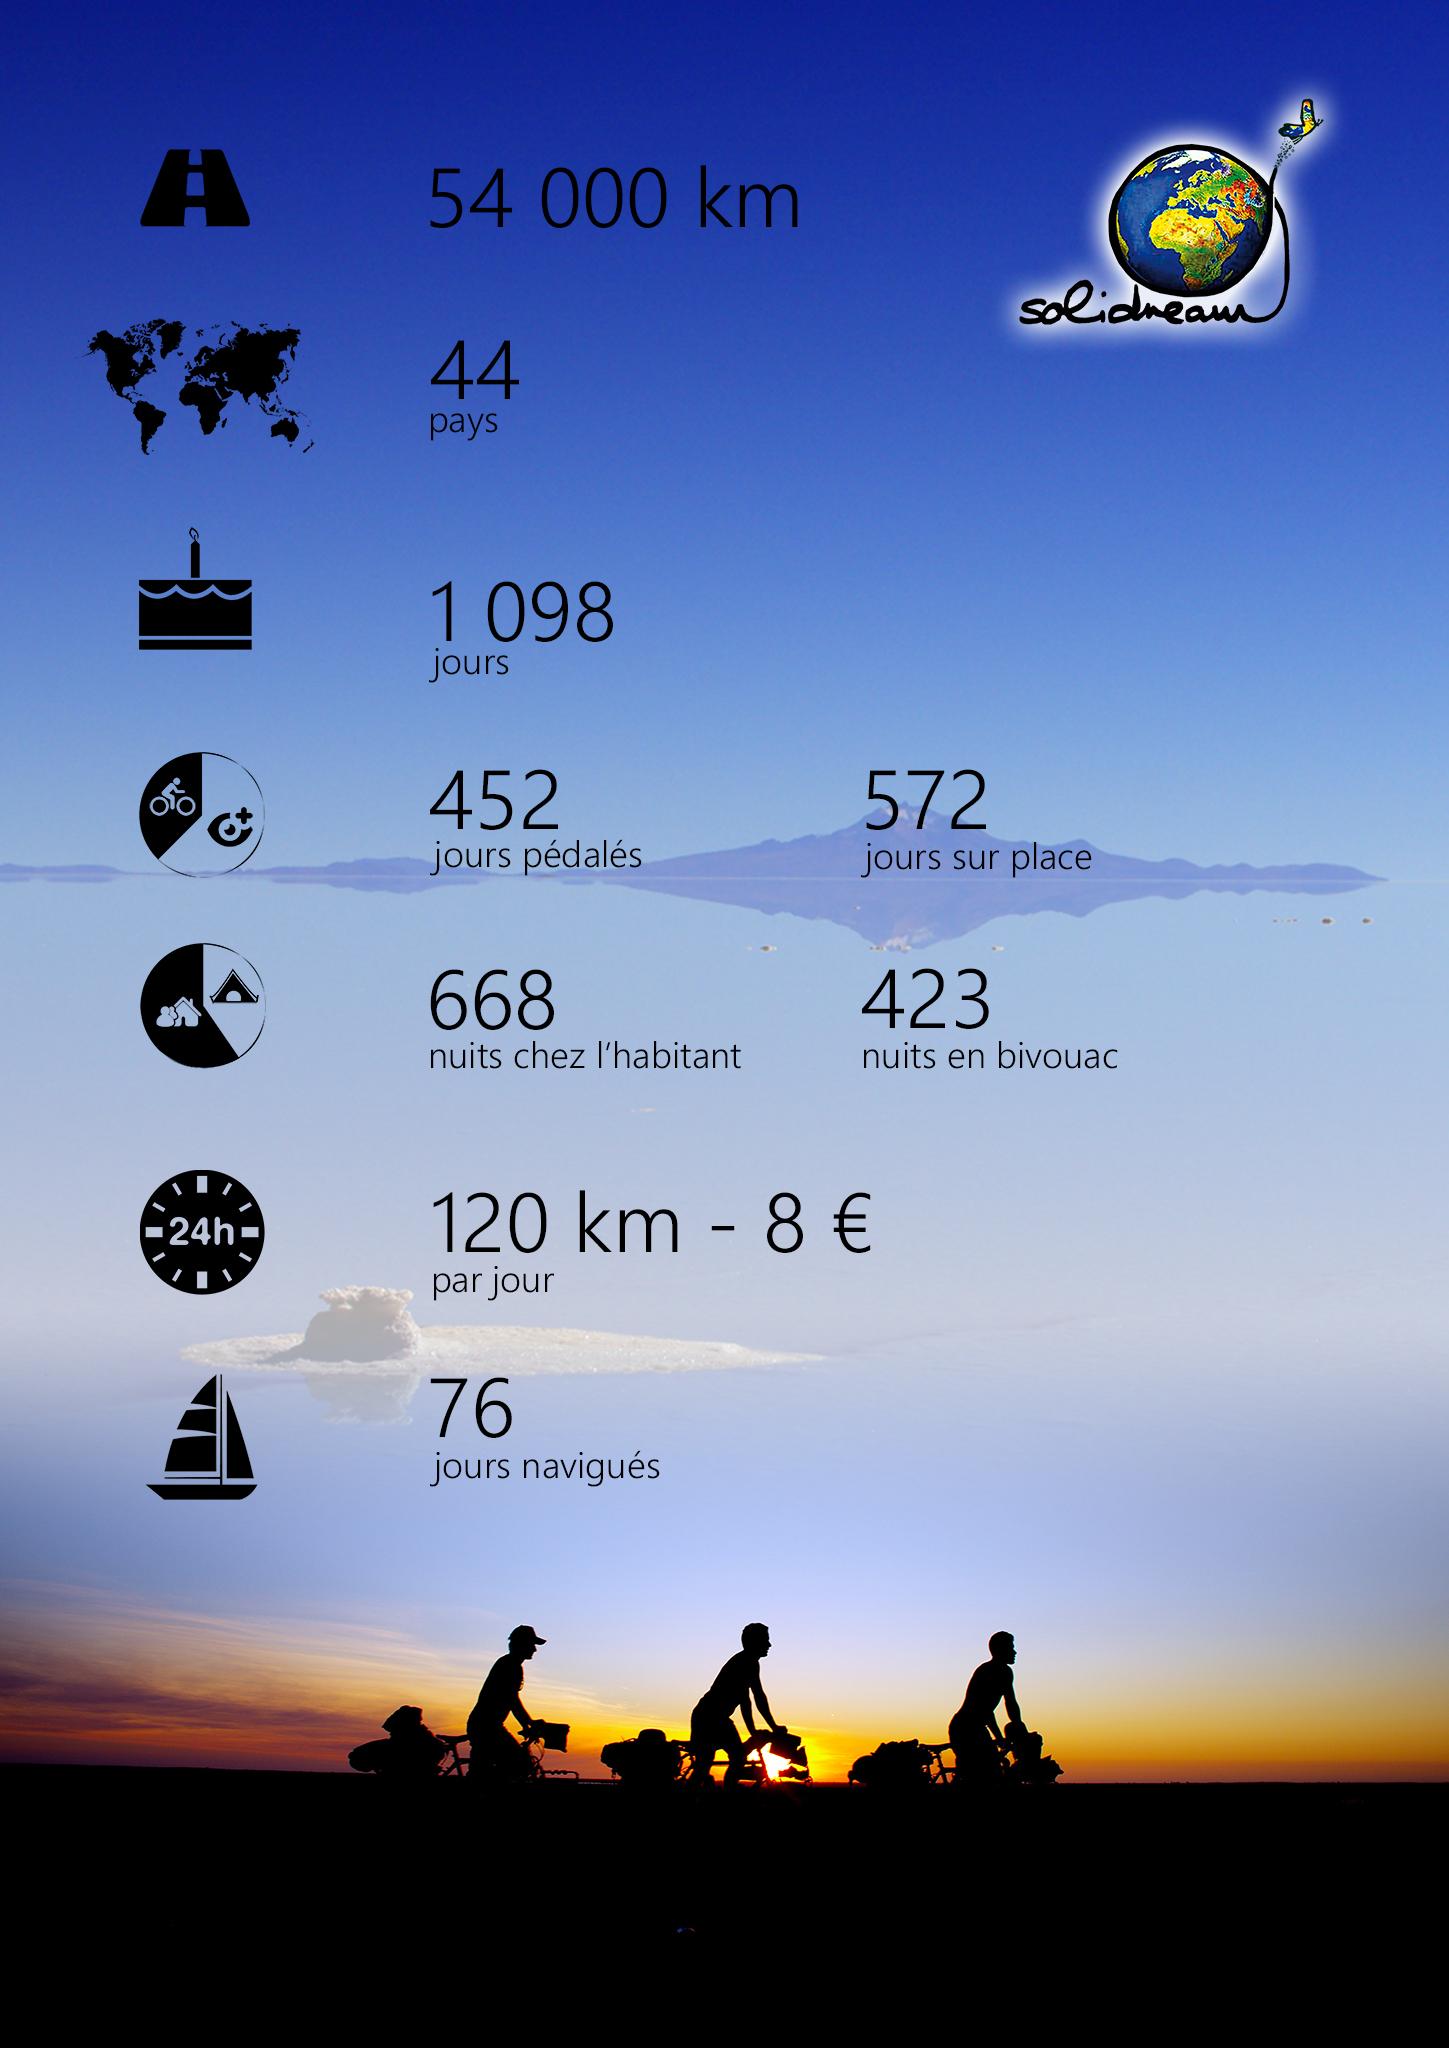 Infographie Solidream